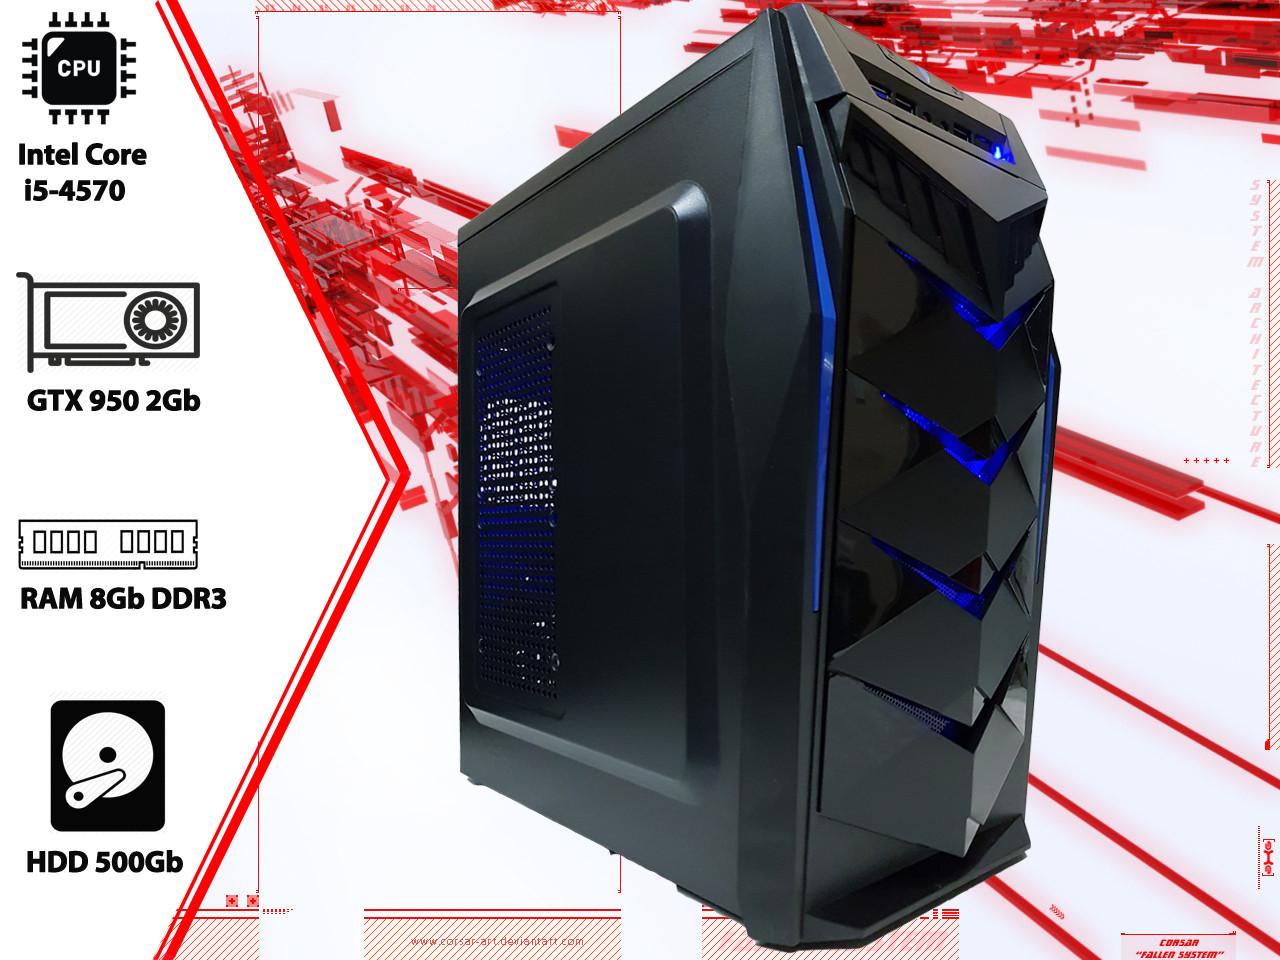 Игровой ПК Intel Core i5 4570, GTX 950, DDR3 8Gb, 500Gb